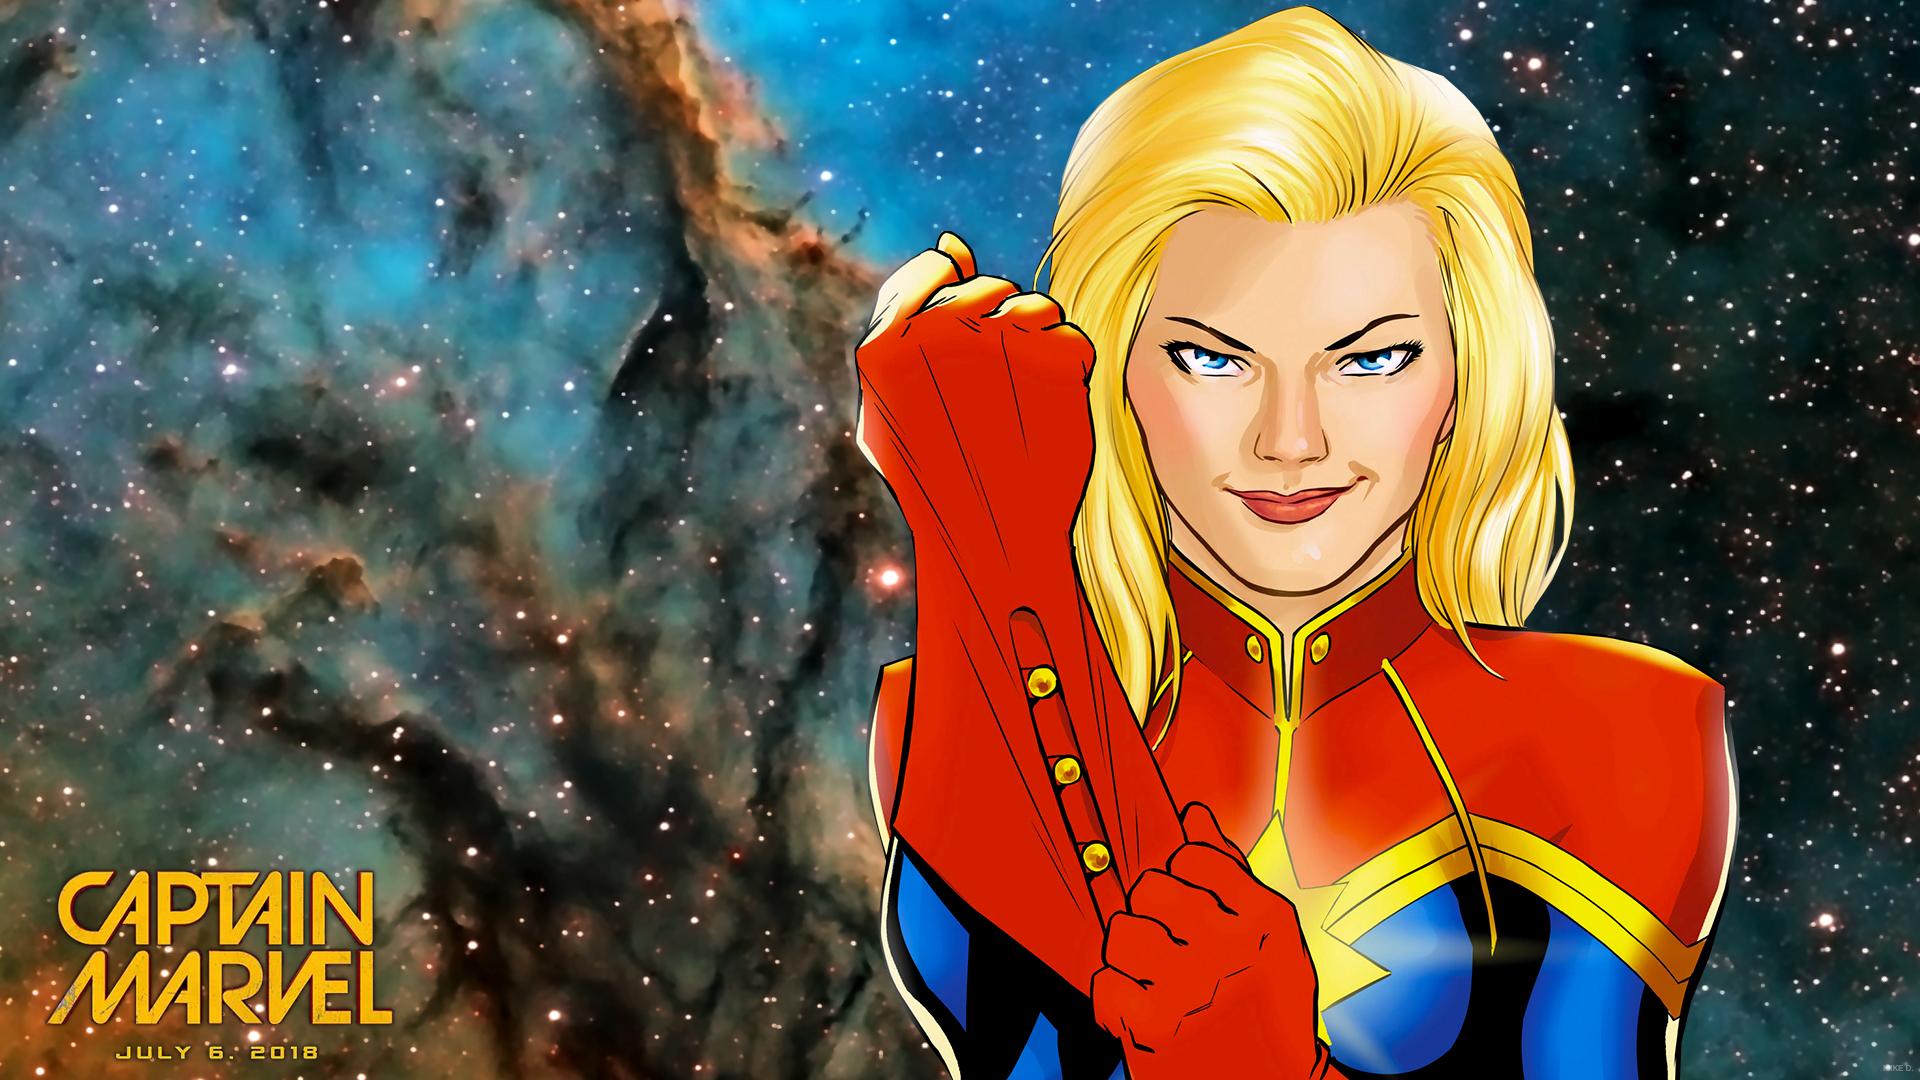 Captain Marvel is a 2019 superhero film based on the Marvel Comics superheroine of the same name It is the twentyfirst installment in the Marvel Cinematic Universe